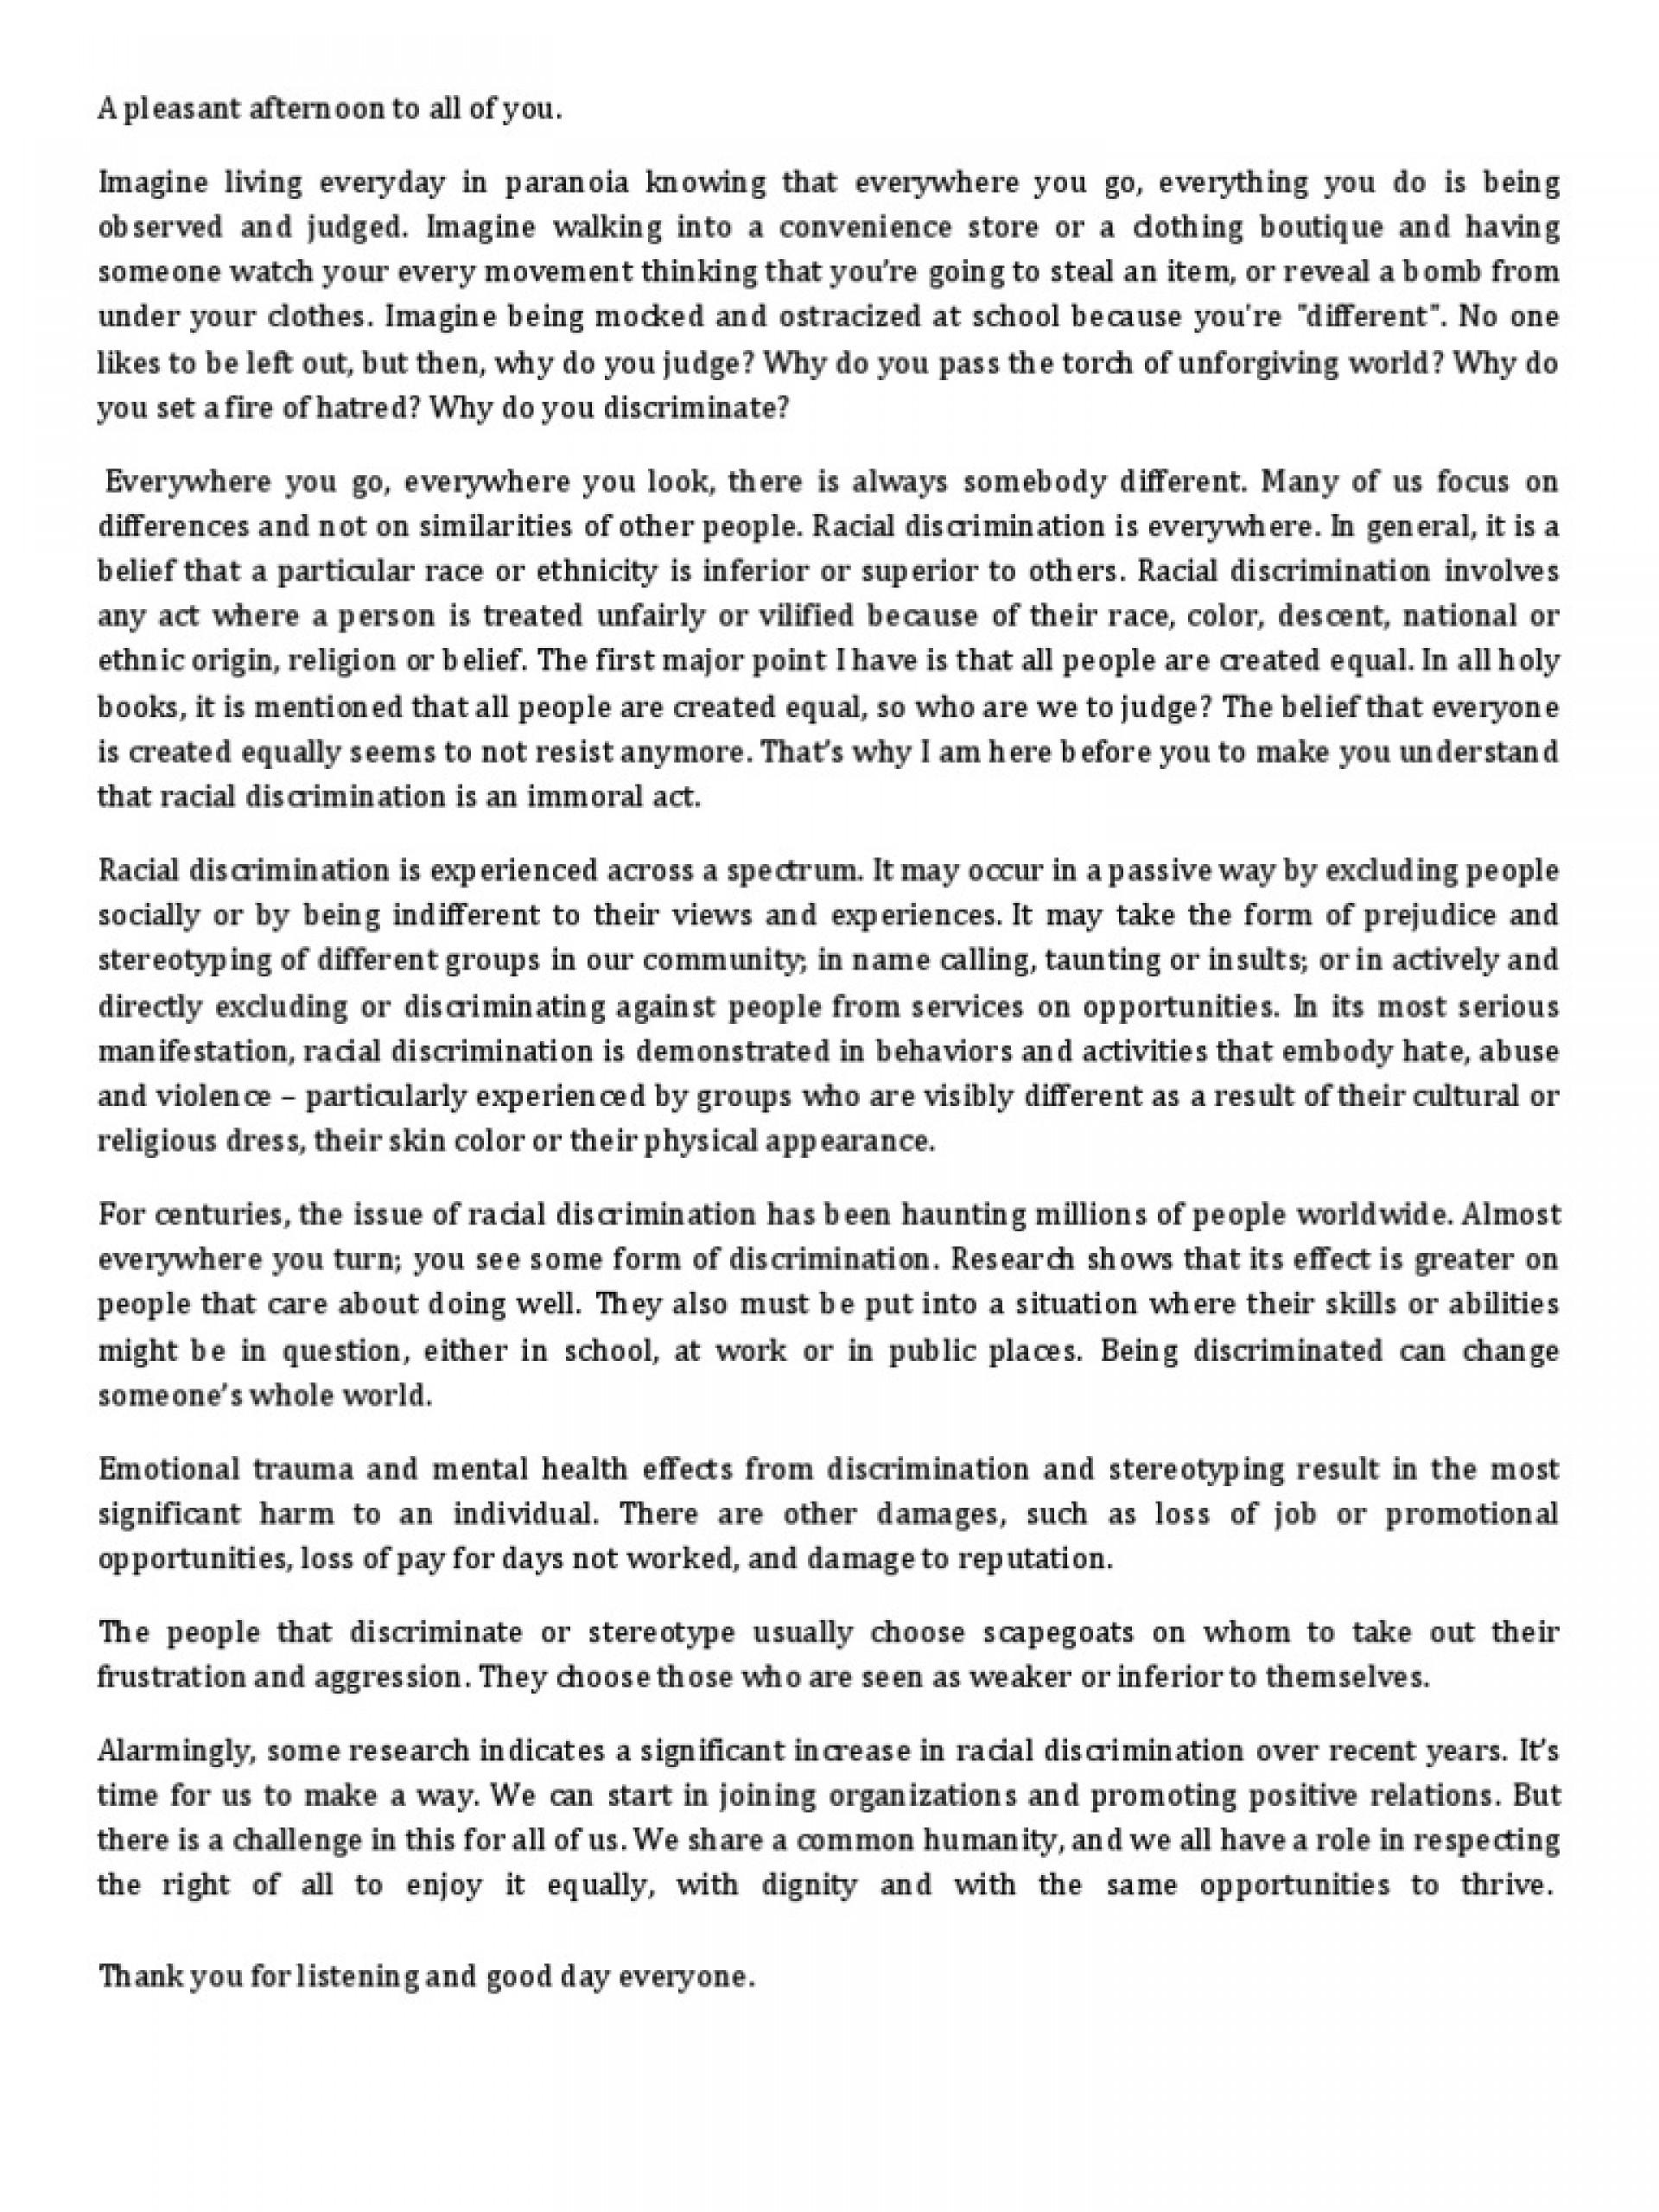 004 Essays On Racism Essay Unbelievable In Schools Best Argumentative 1920